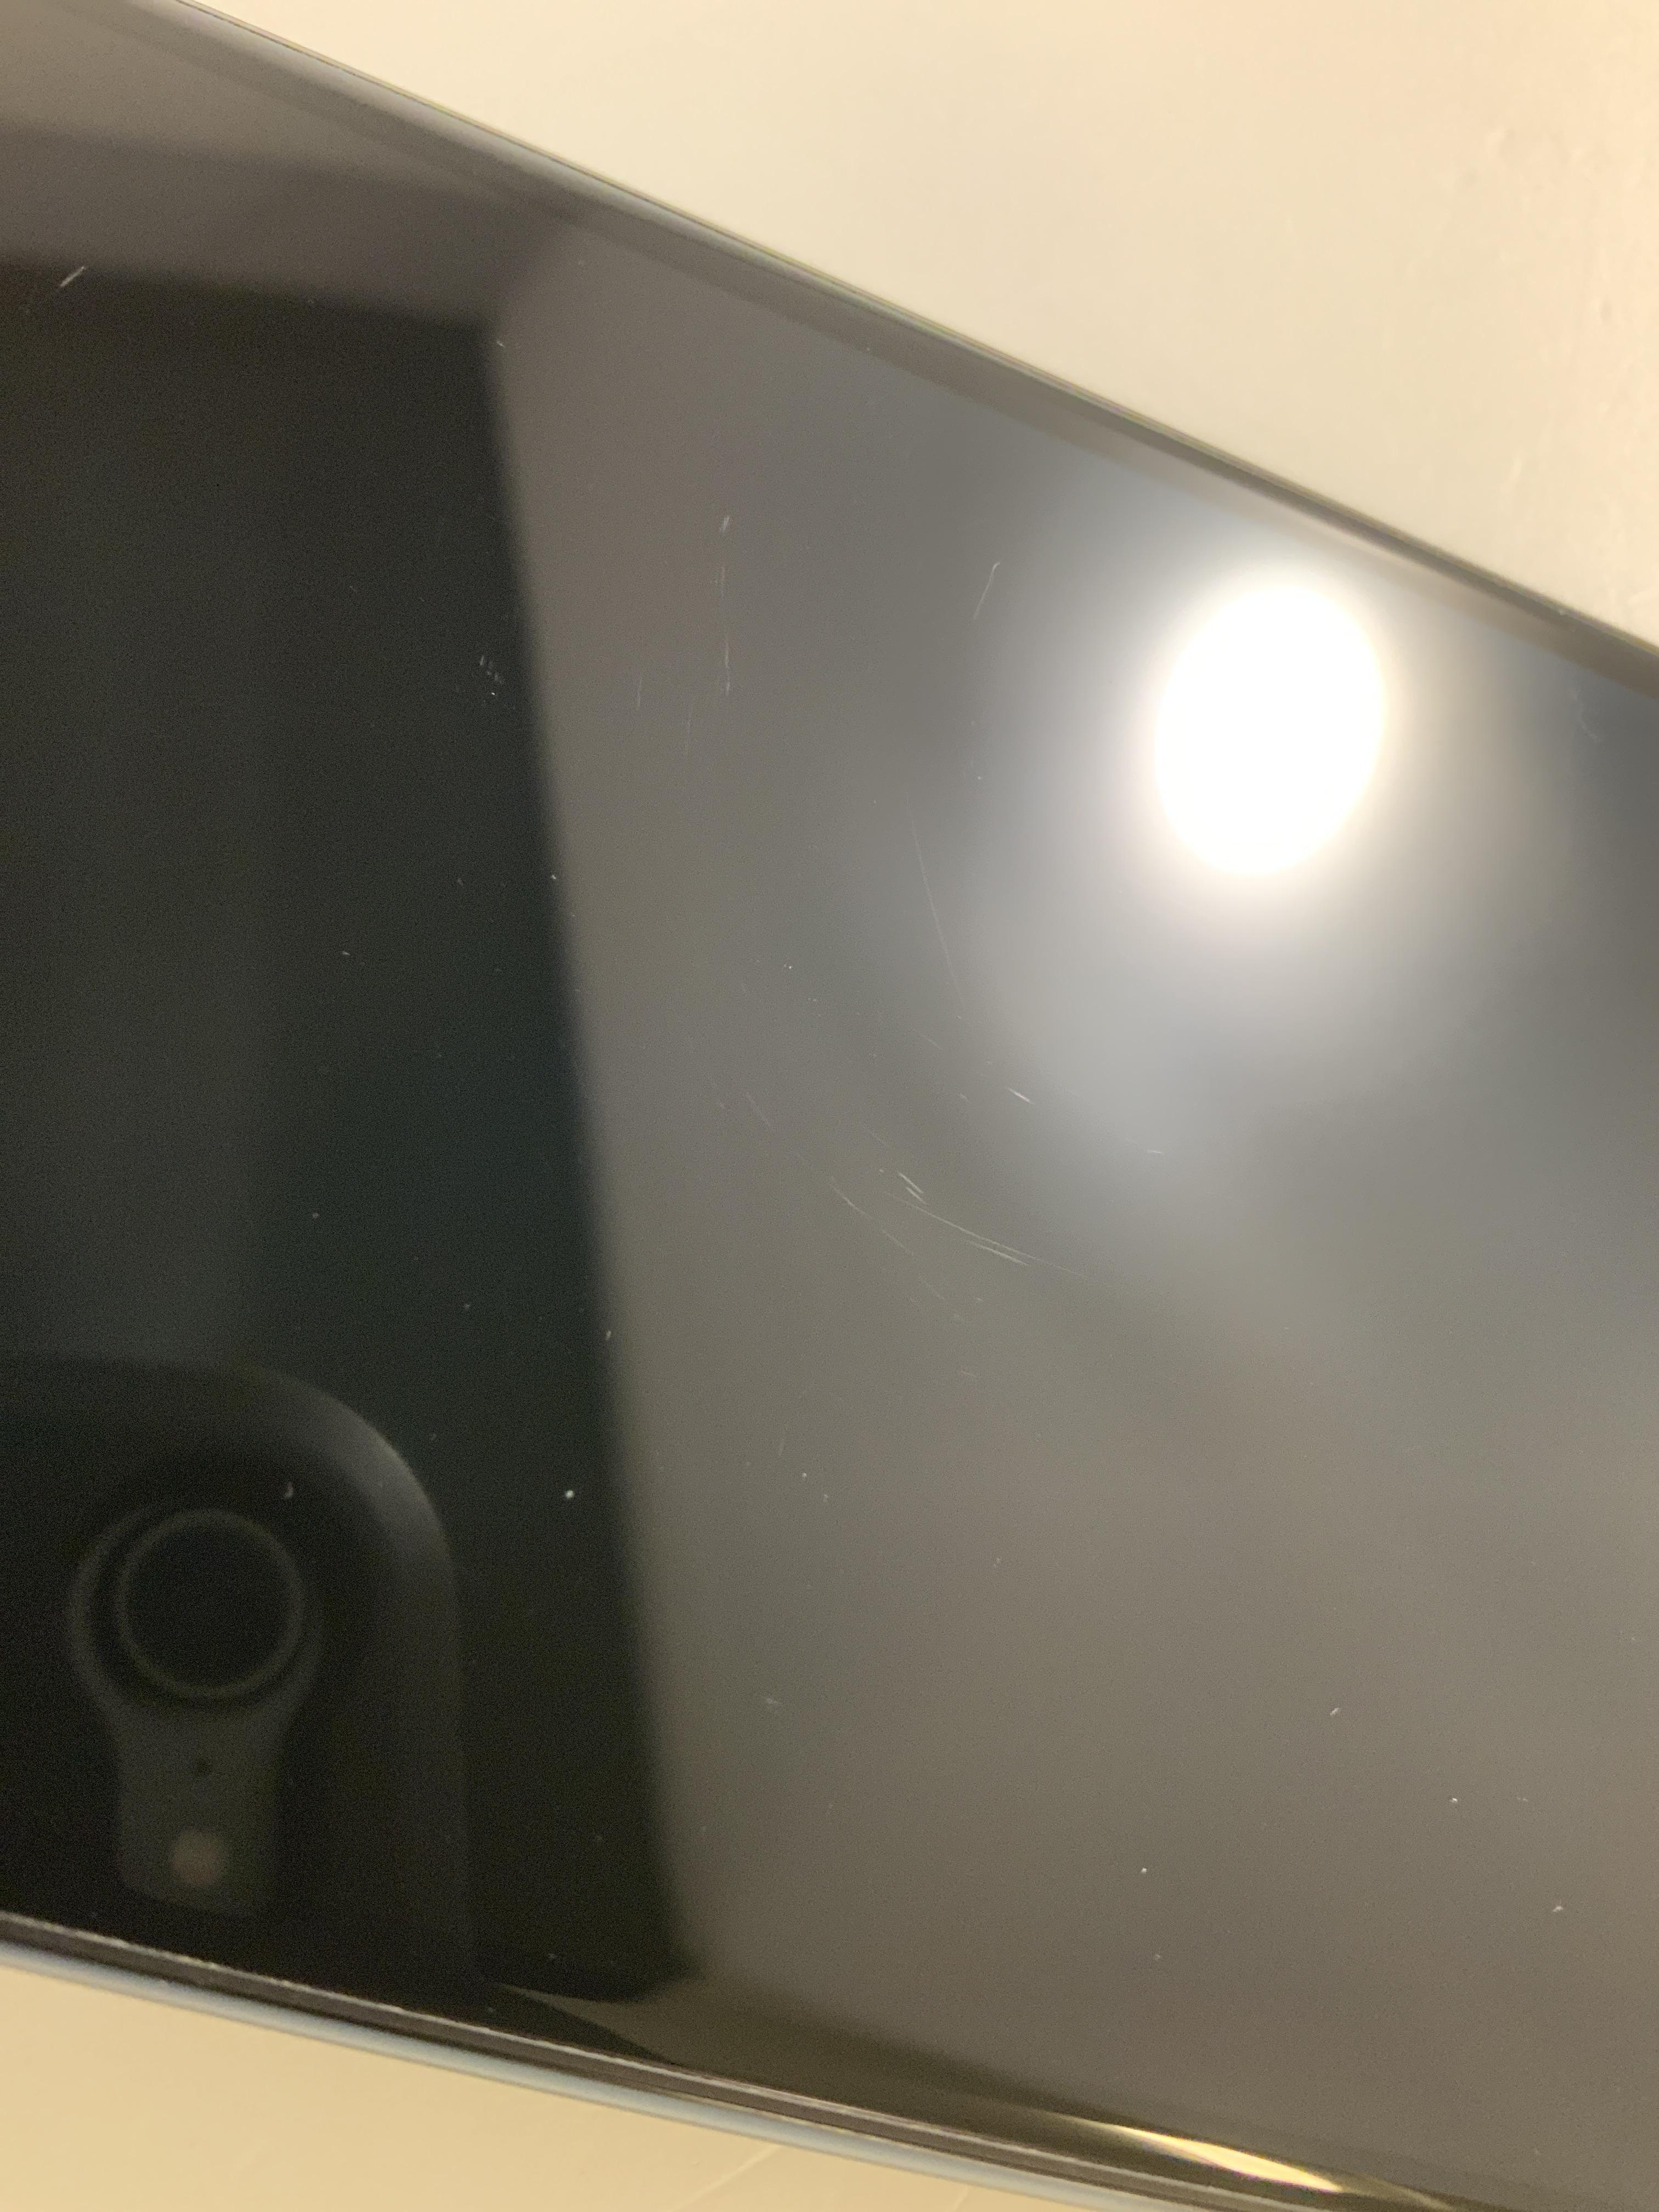 iPhone 11 Pro 64GB, 64GB, Midnight Green, Afbeelding 3